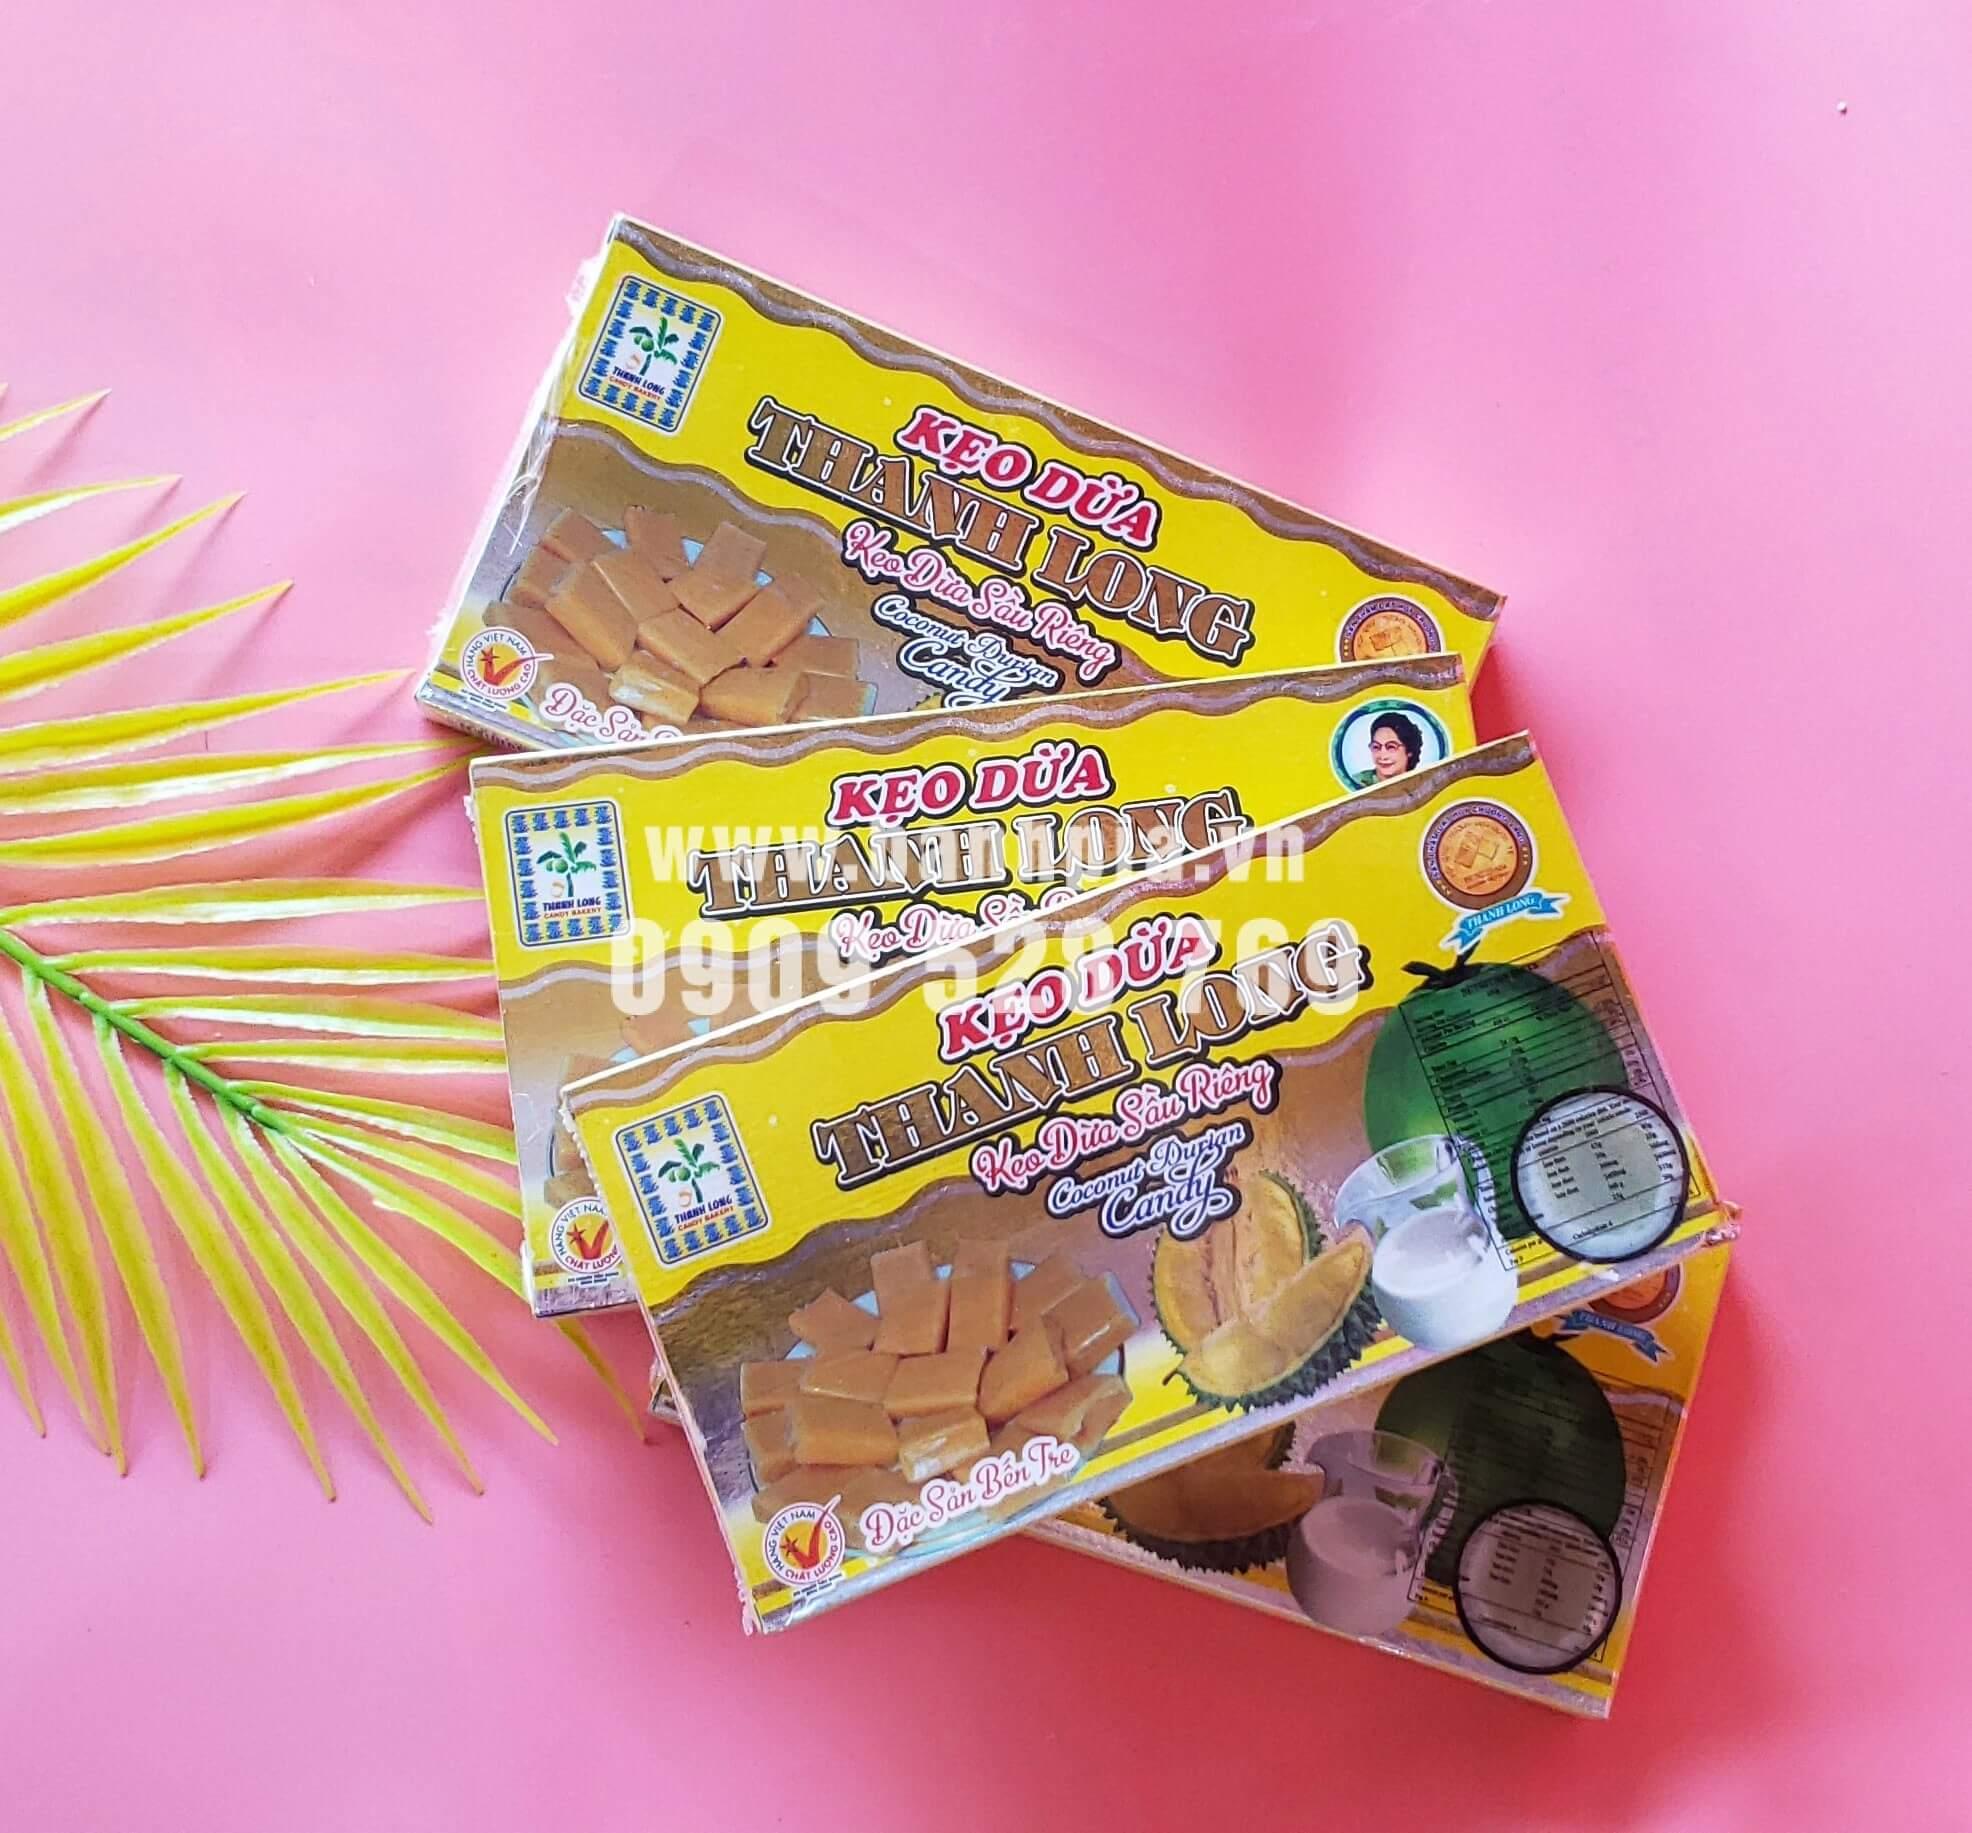 Kẹo dừa Thanh Long